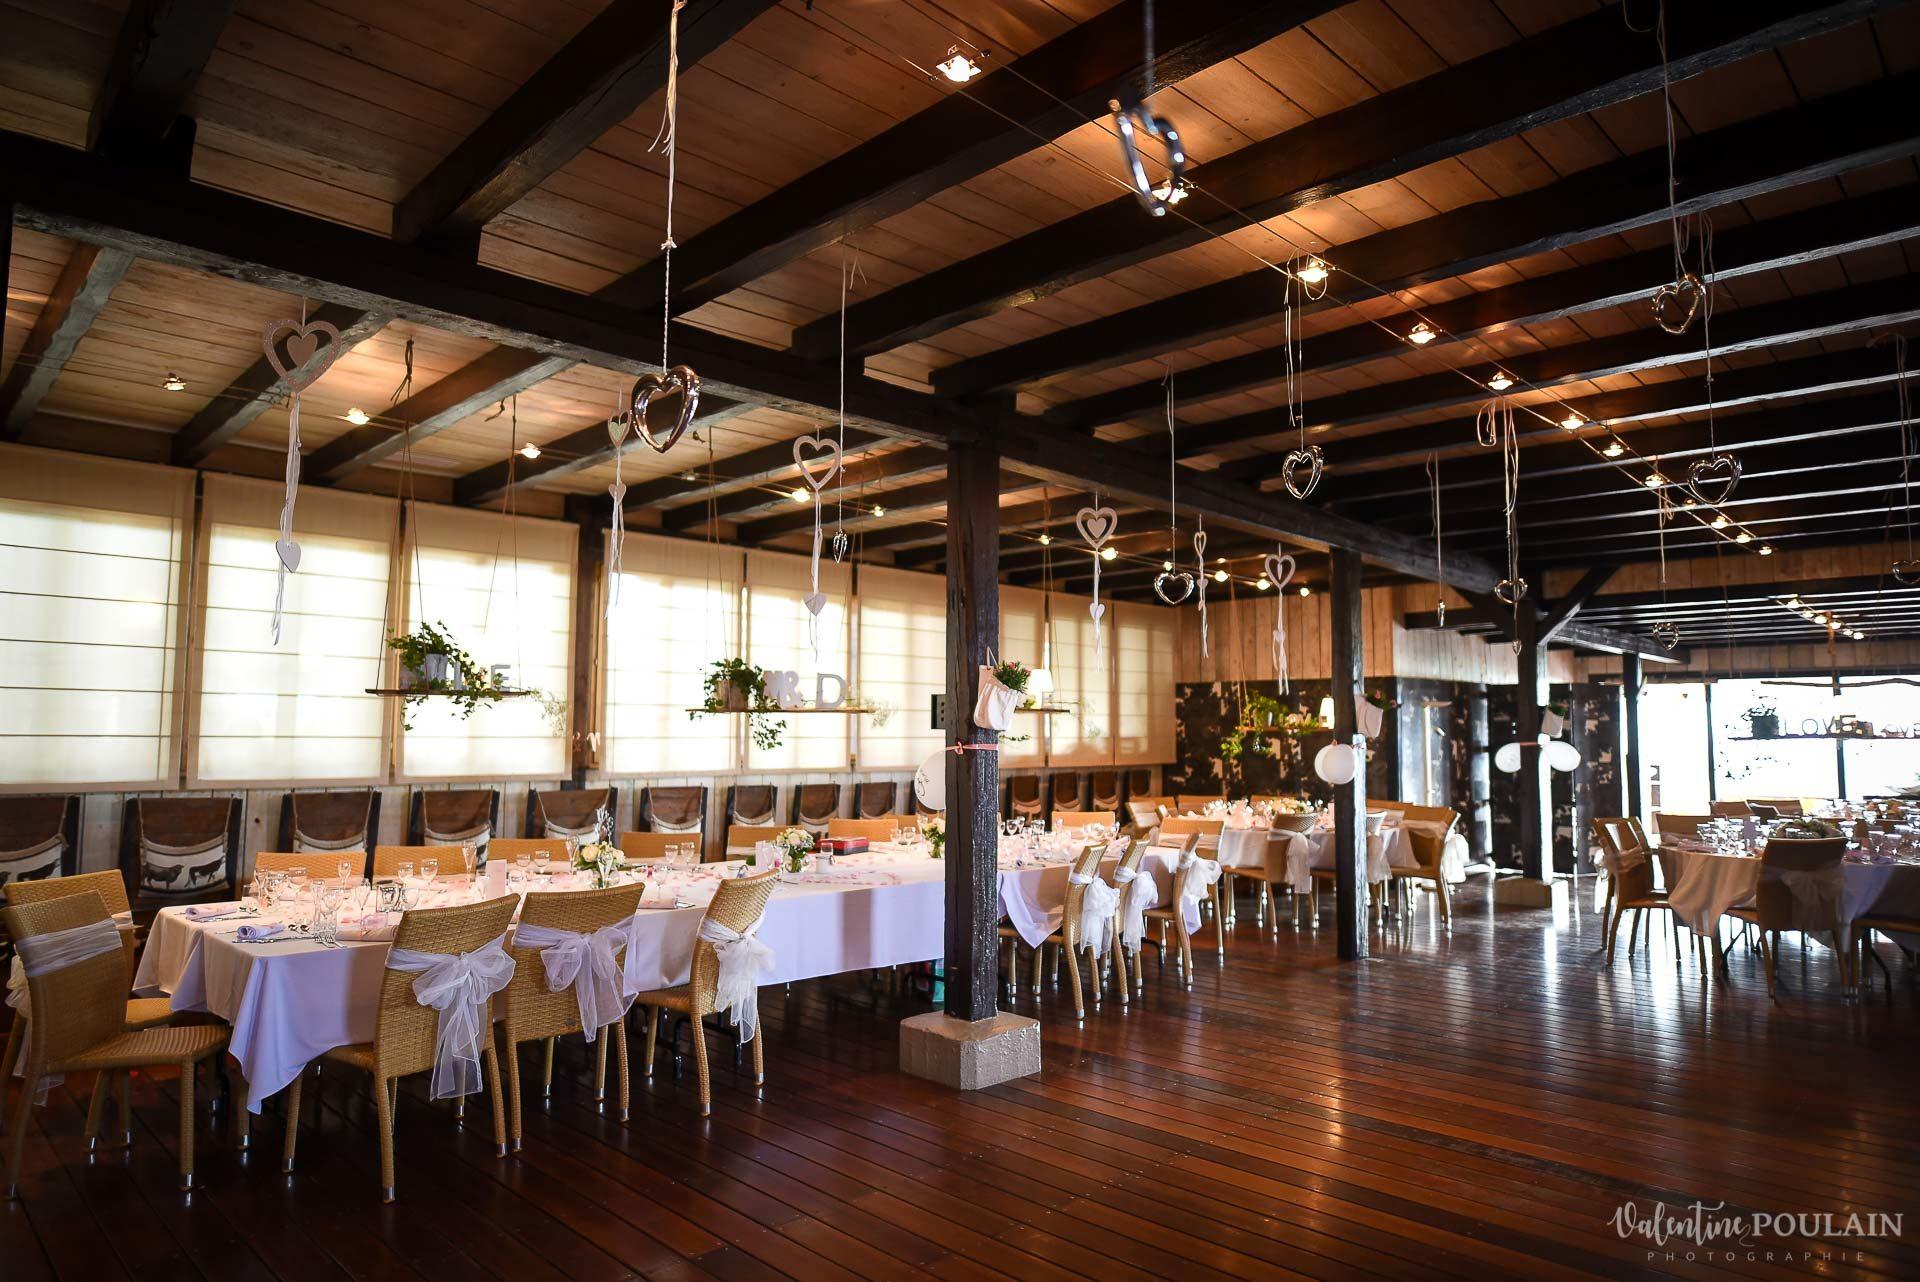 Mariage cool ferme weyerbach - Valentine Poulain salle